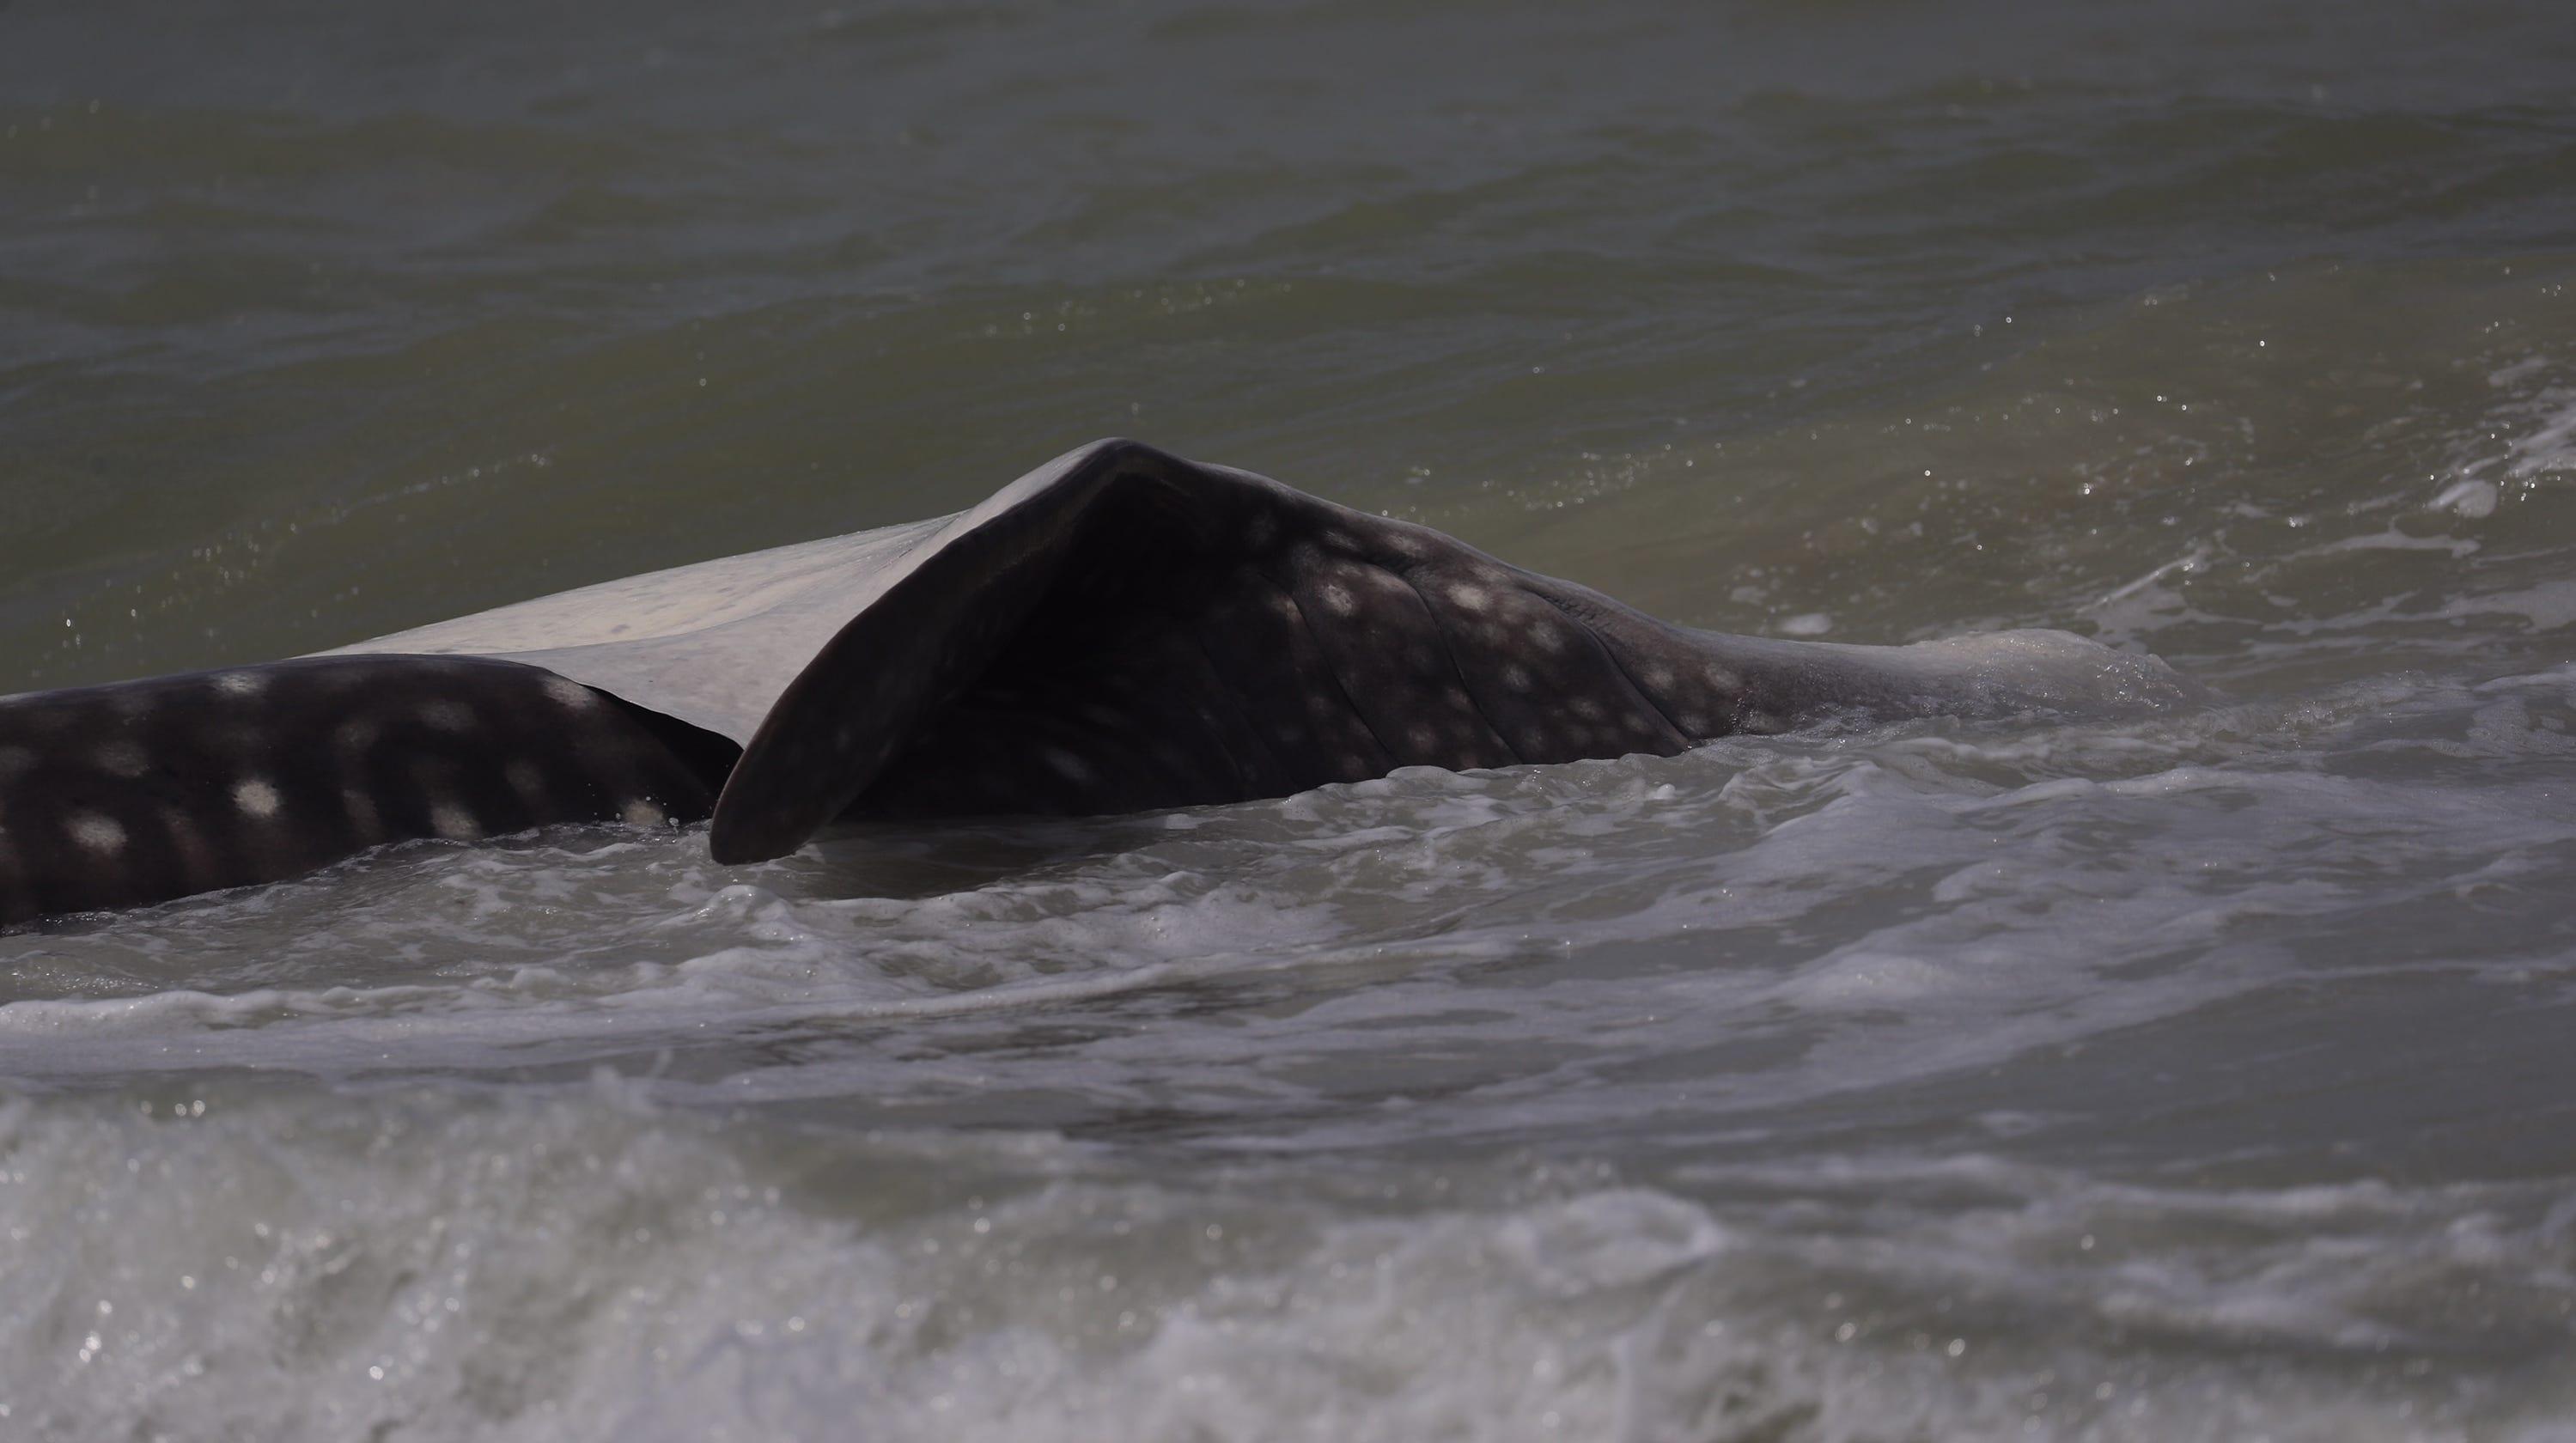 Whale shark carcass washes ashore on sanibel island florida altavistaventures Image collections